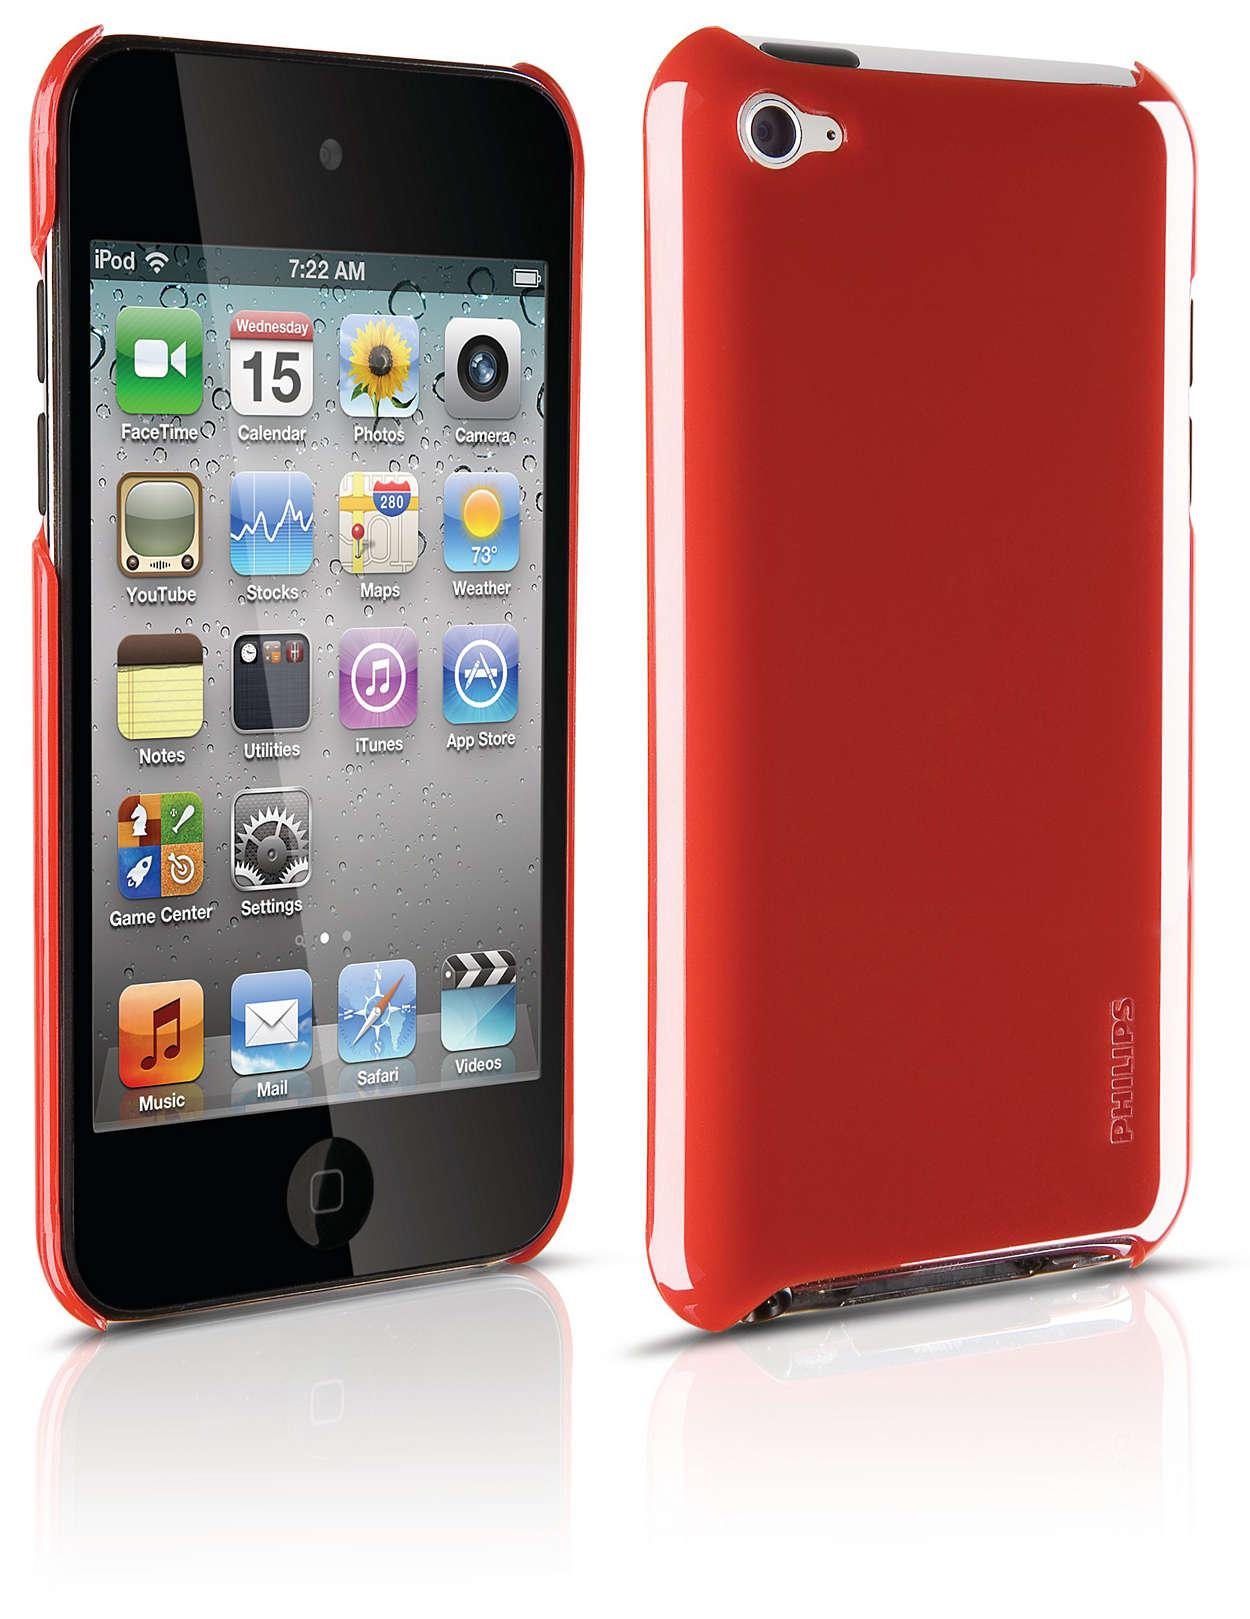 Beskyt din iPod i et robust etui